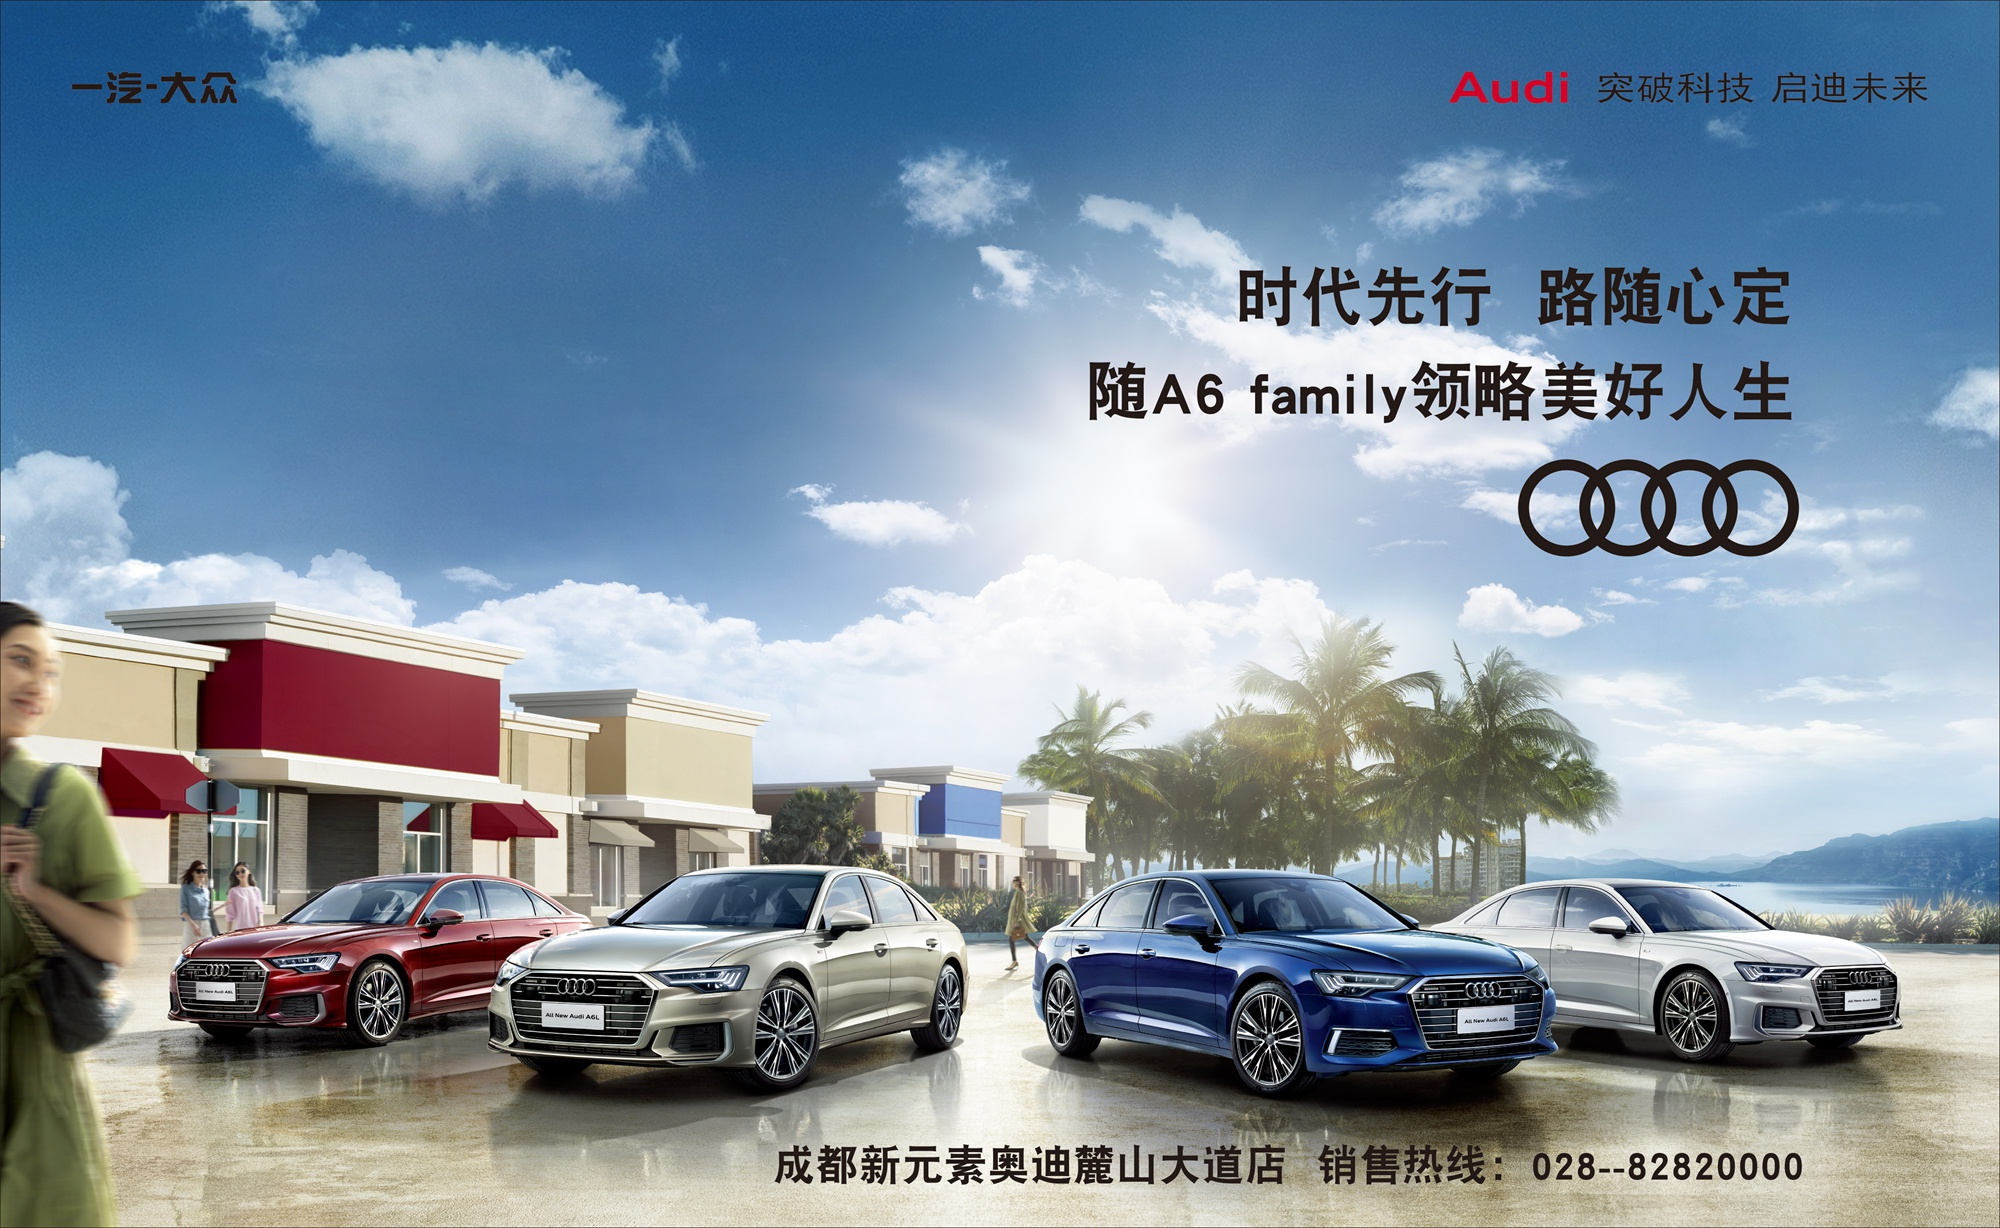 A6 family丨总有一款适合您!